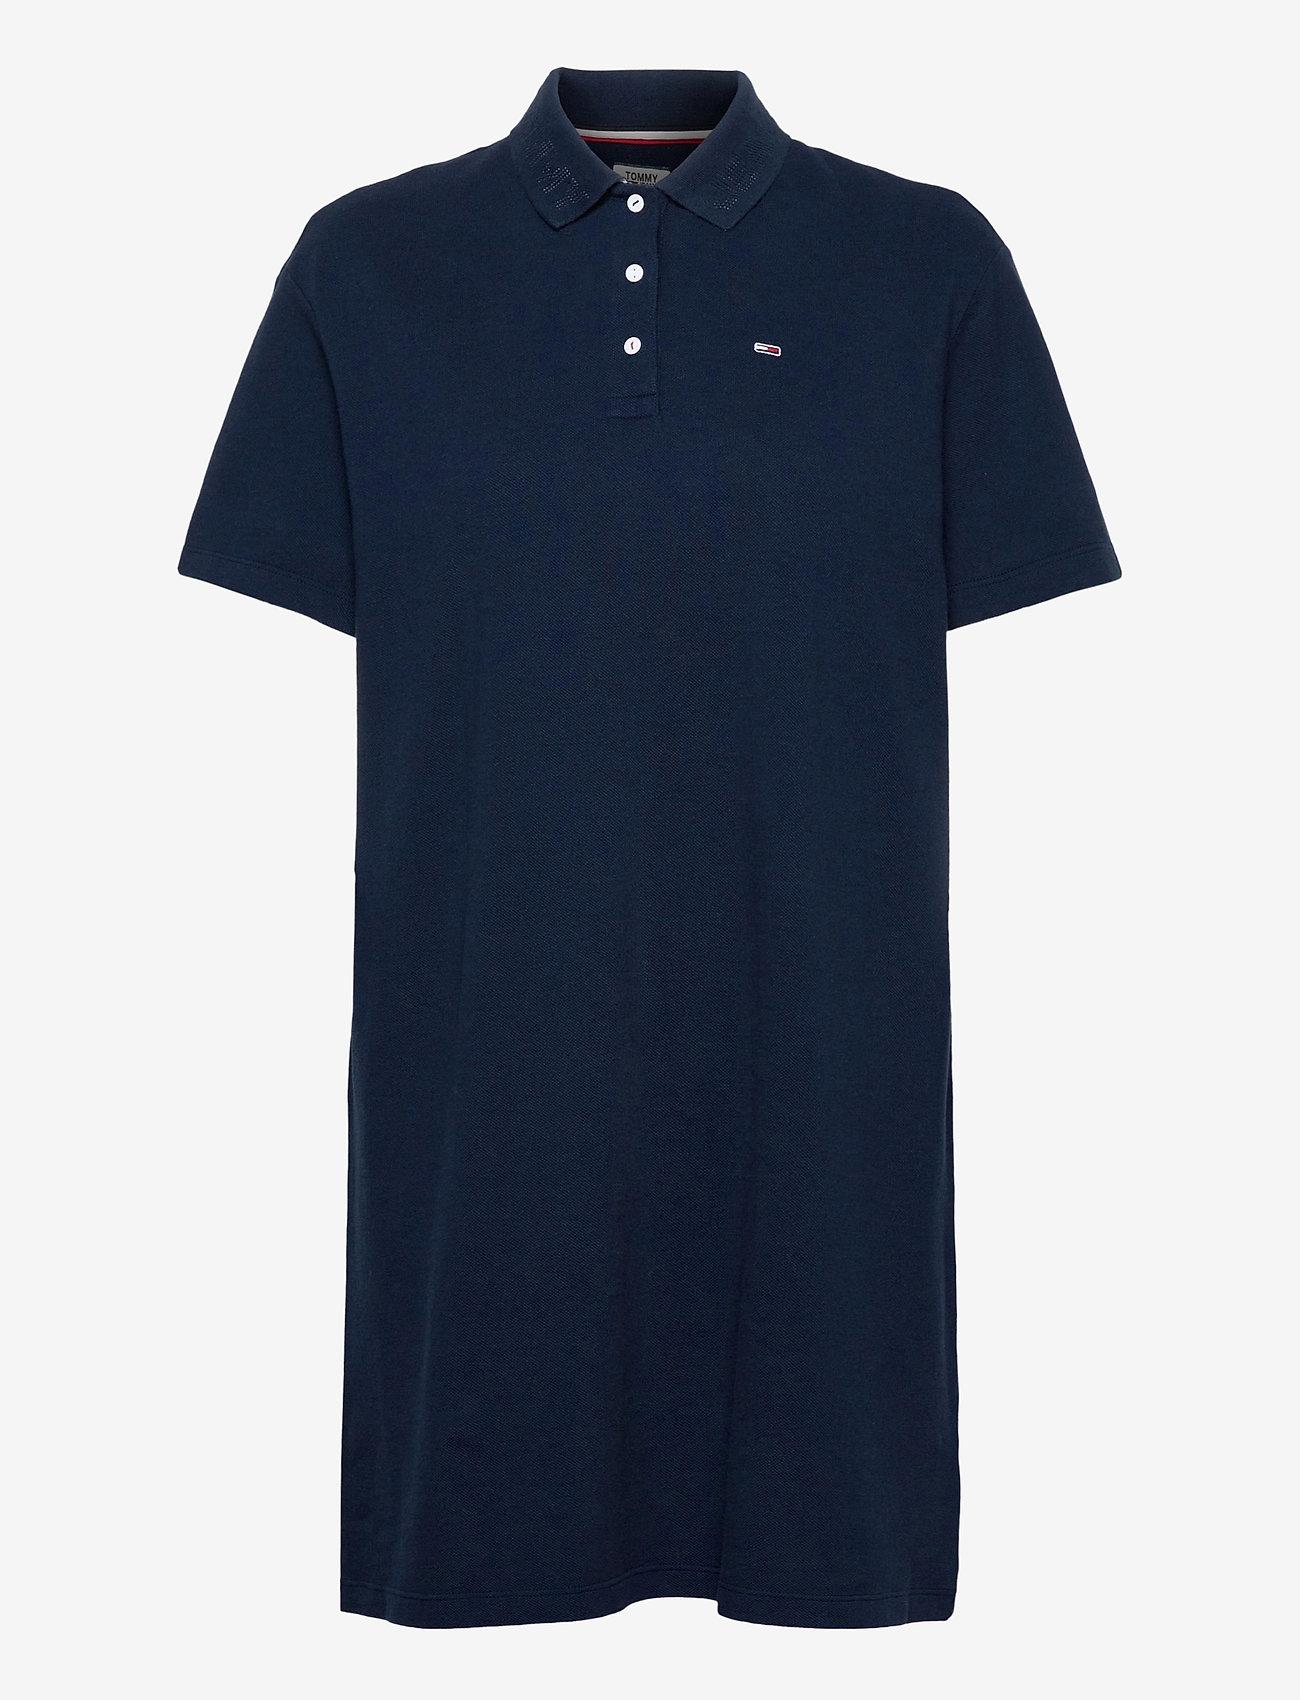 Tommy Jeans - TJW BRANDED COLLAR POLO DRESS - t-shirtklänningar - twilight navy - 0